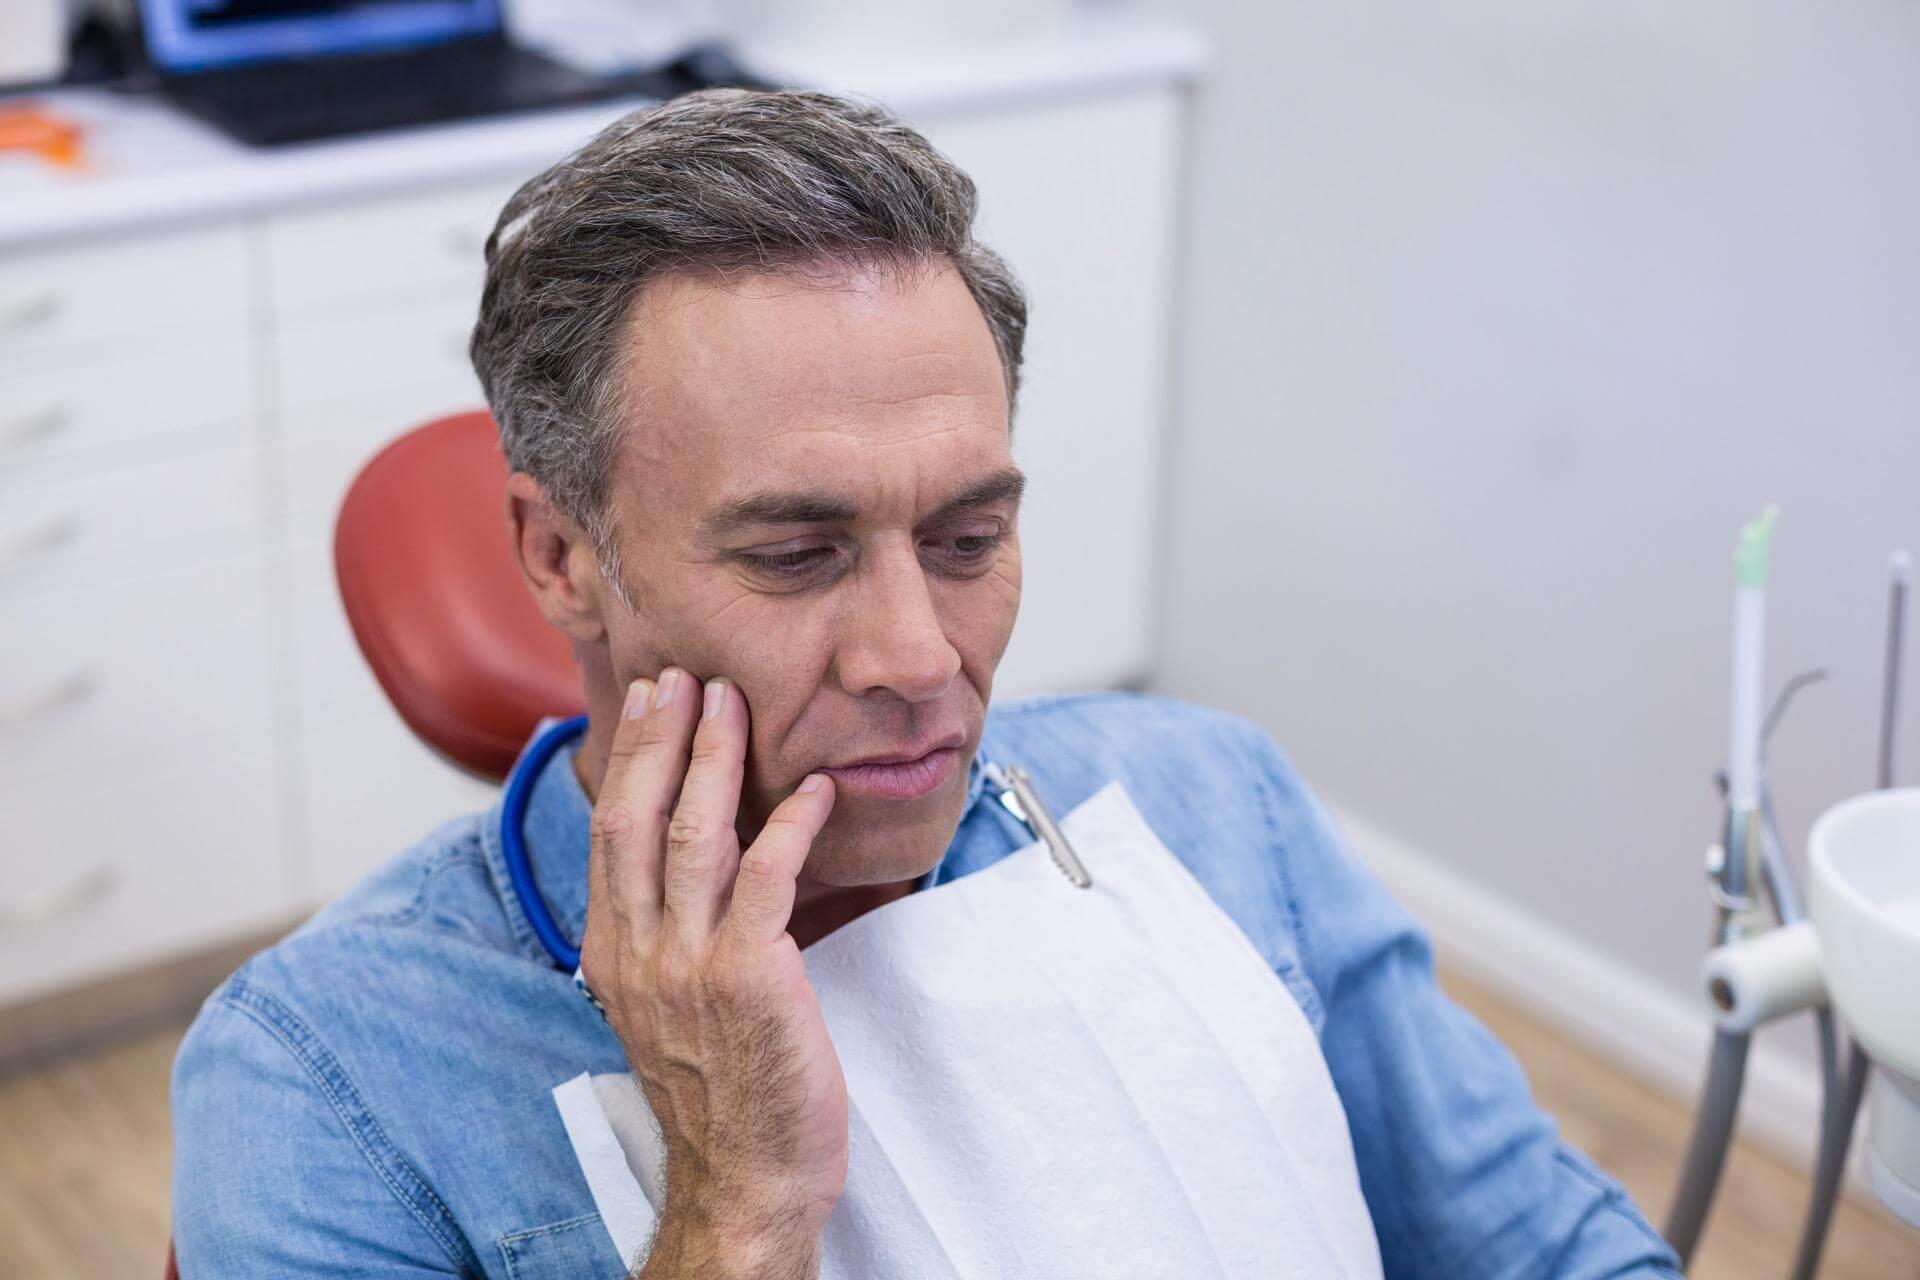 Зъбобол Варна - Медика 3 Дент